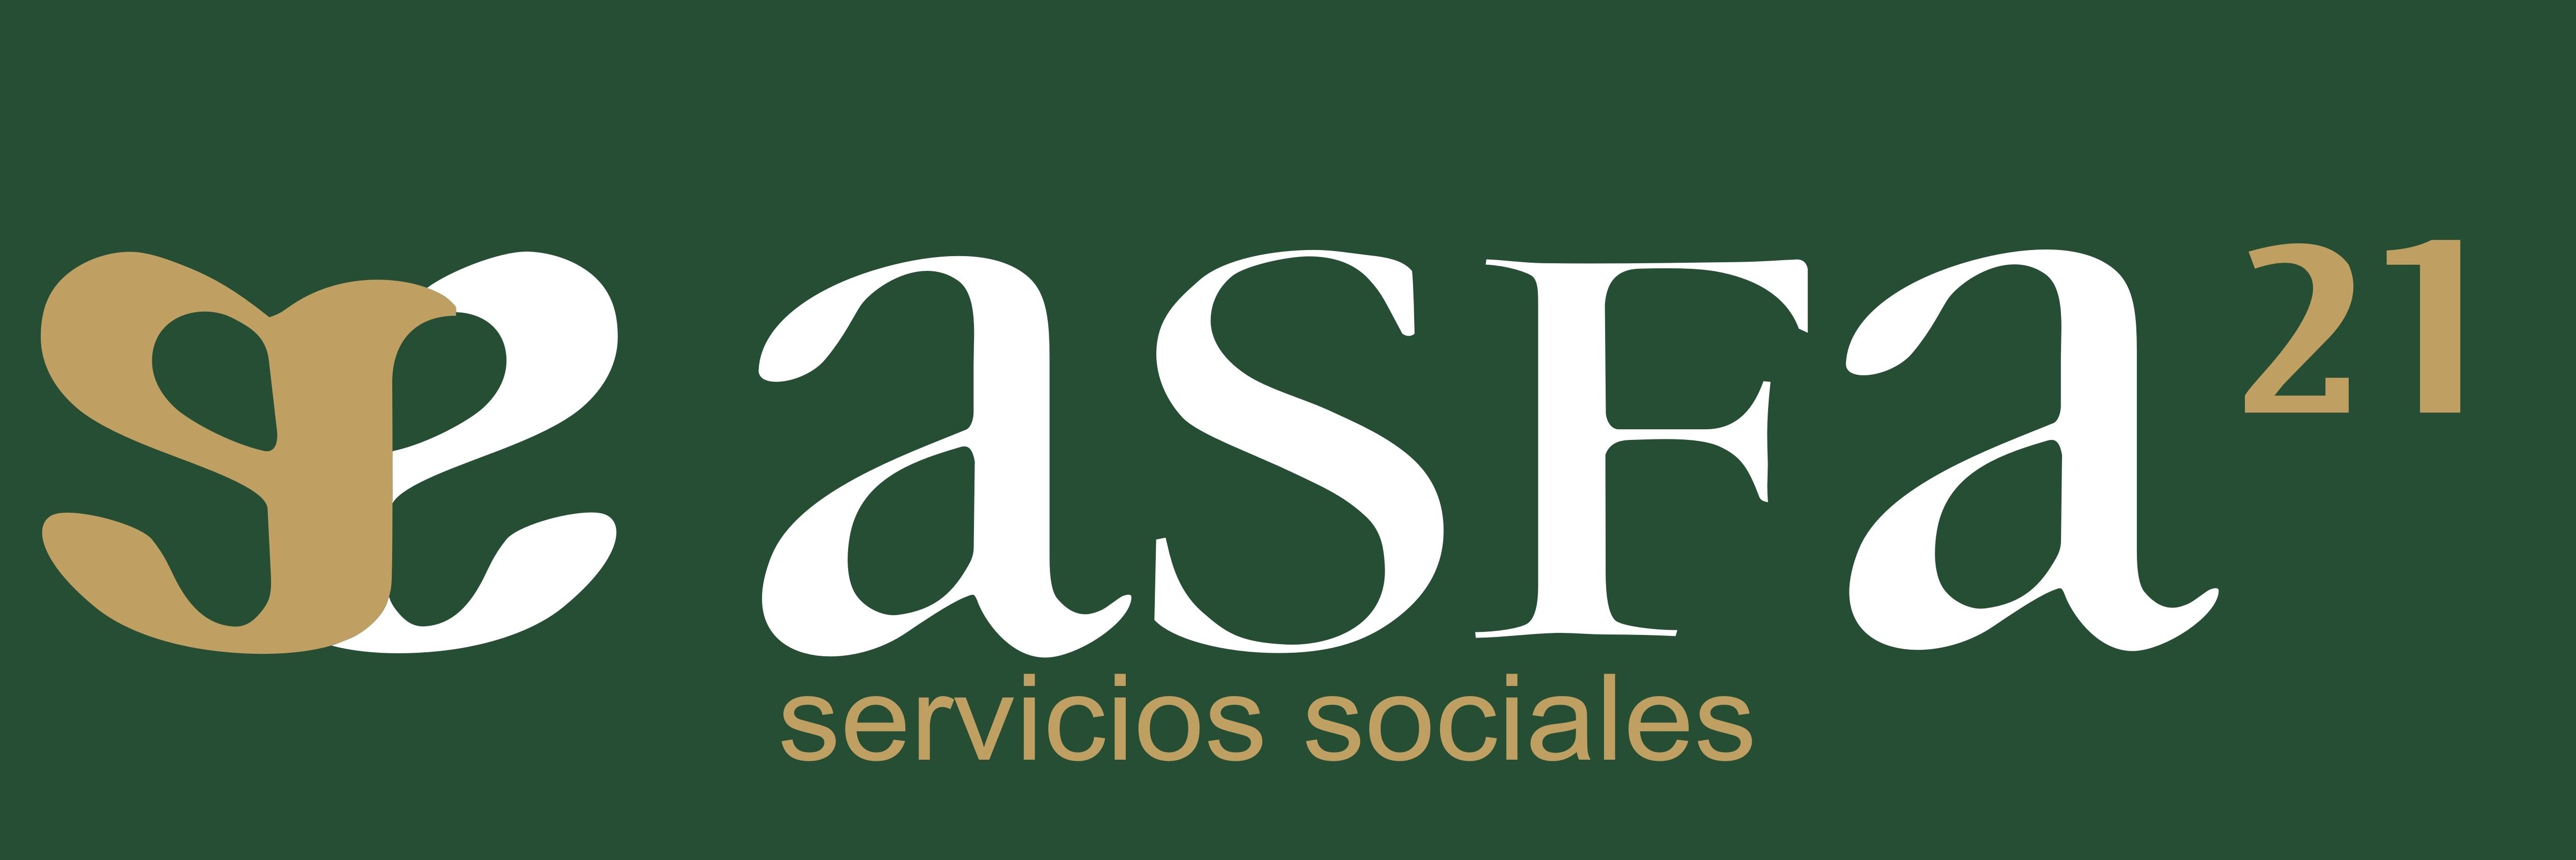 Empresas En Barcelona 101empresas # Muebles Nuri Tenerife